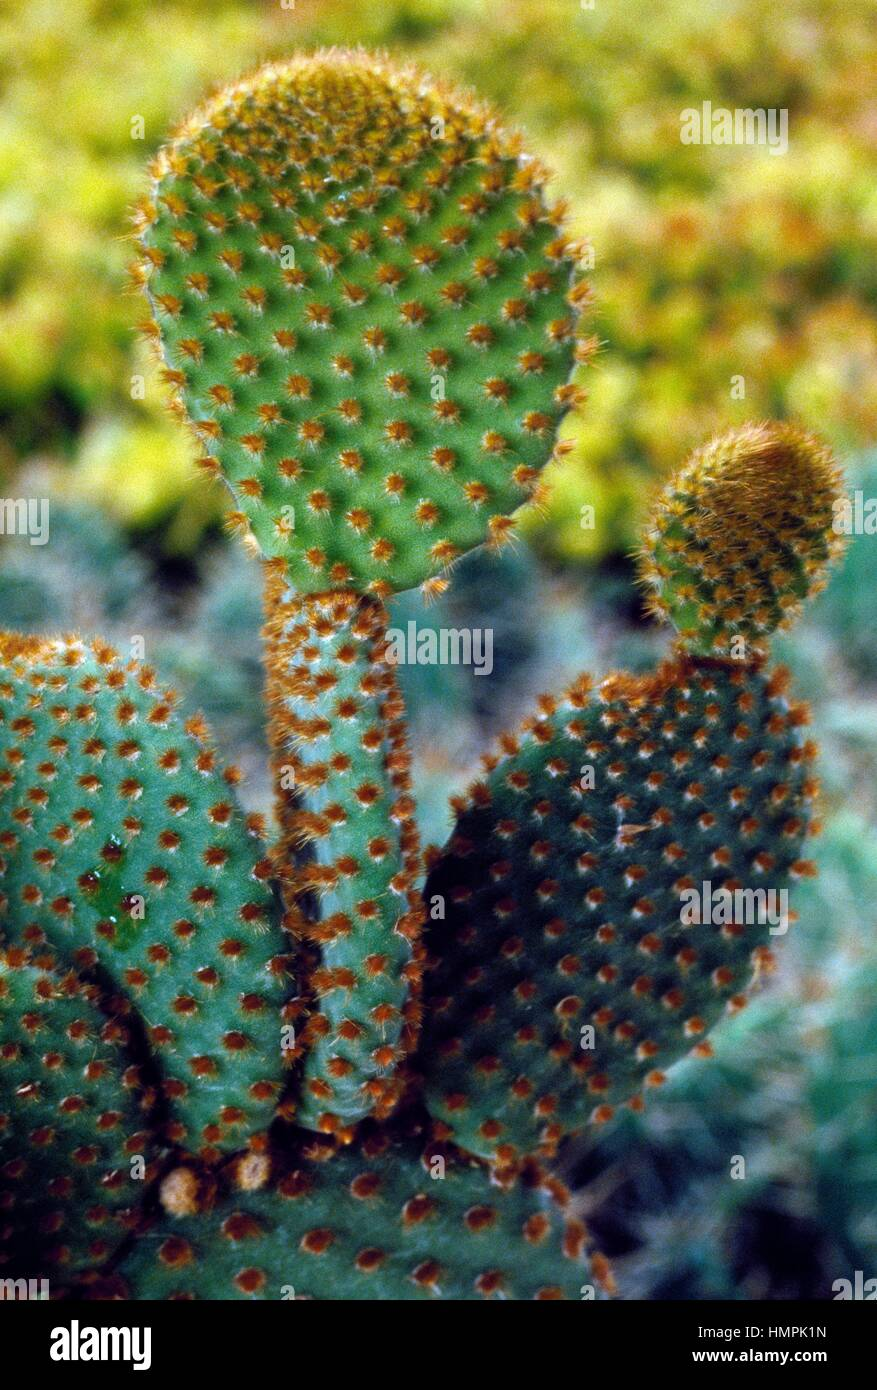 Bunny Ohren Kaktus (Opuntia Microdasys), Cactaceae. Detail der Kladodien. Stockbild